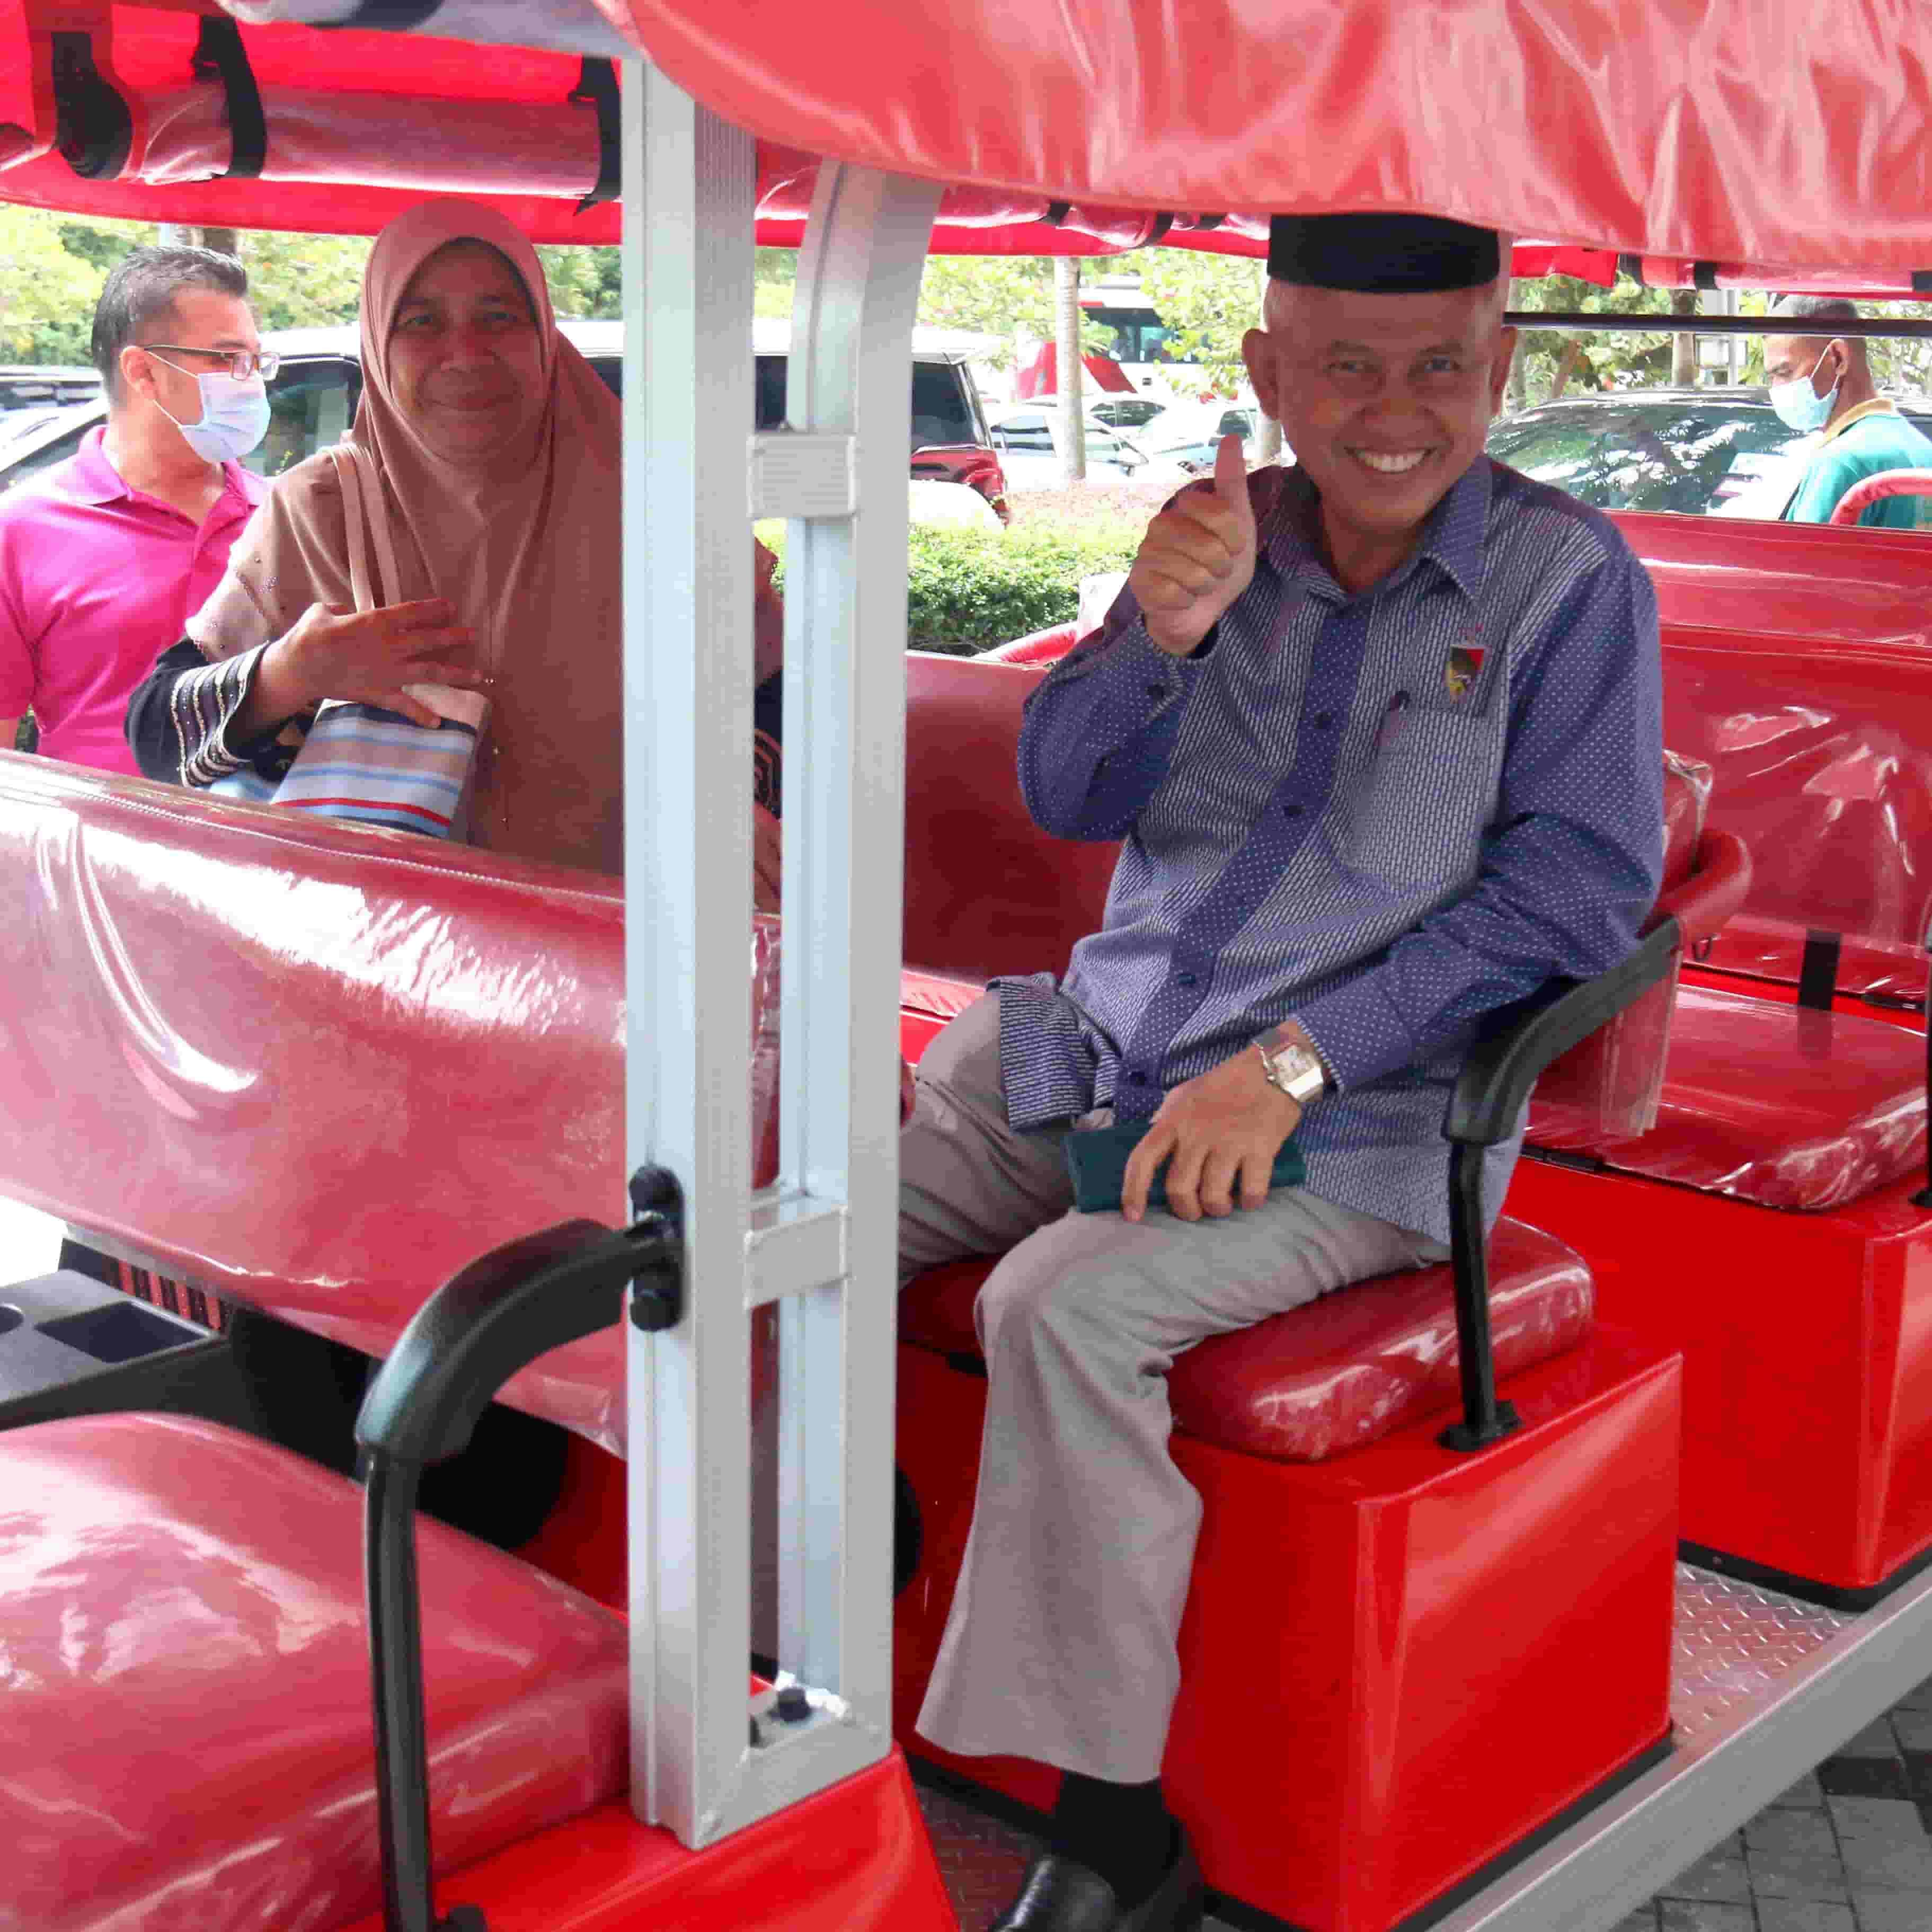 News 2020 - Nobel Visit by Undang Luak | Lexis Hibiscus® Port Dickson